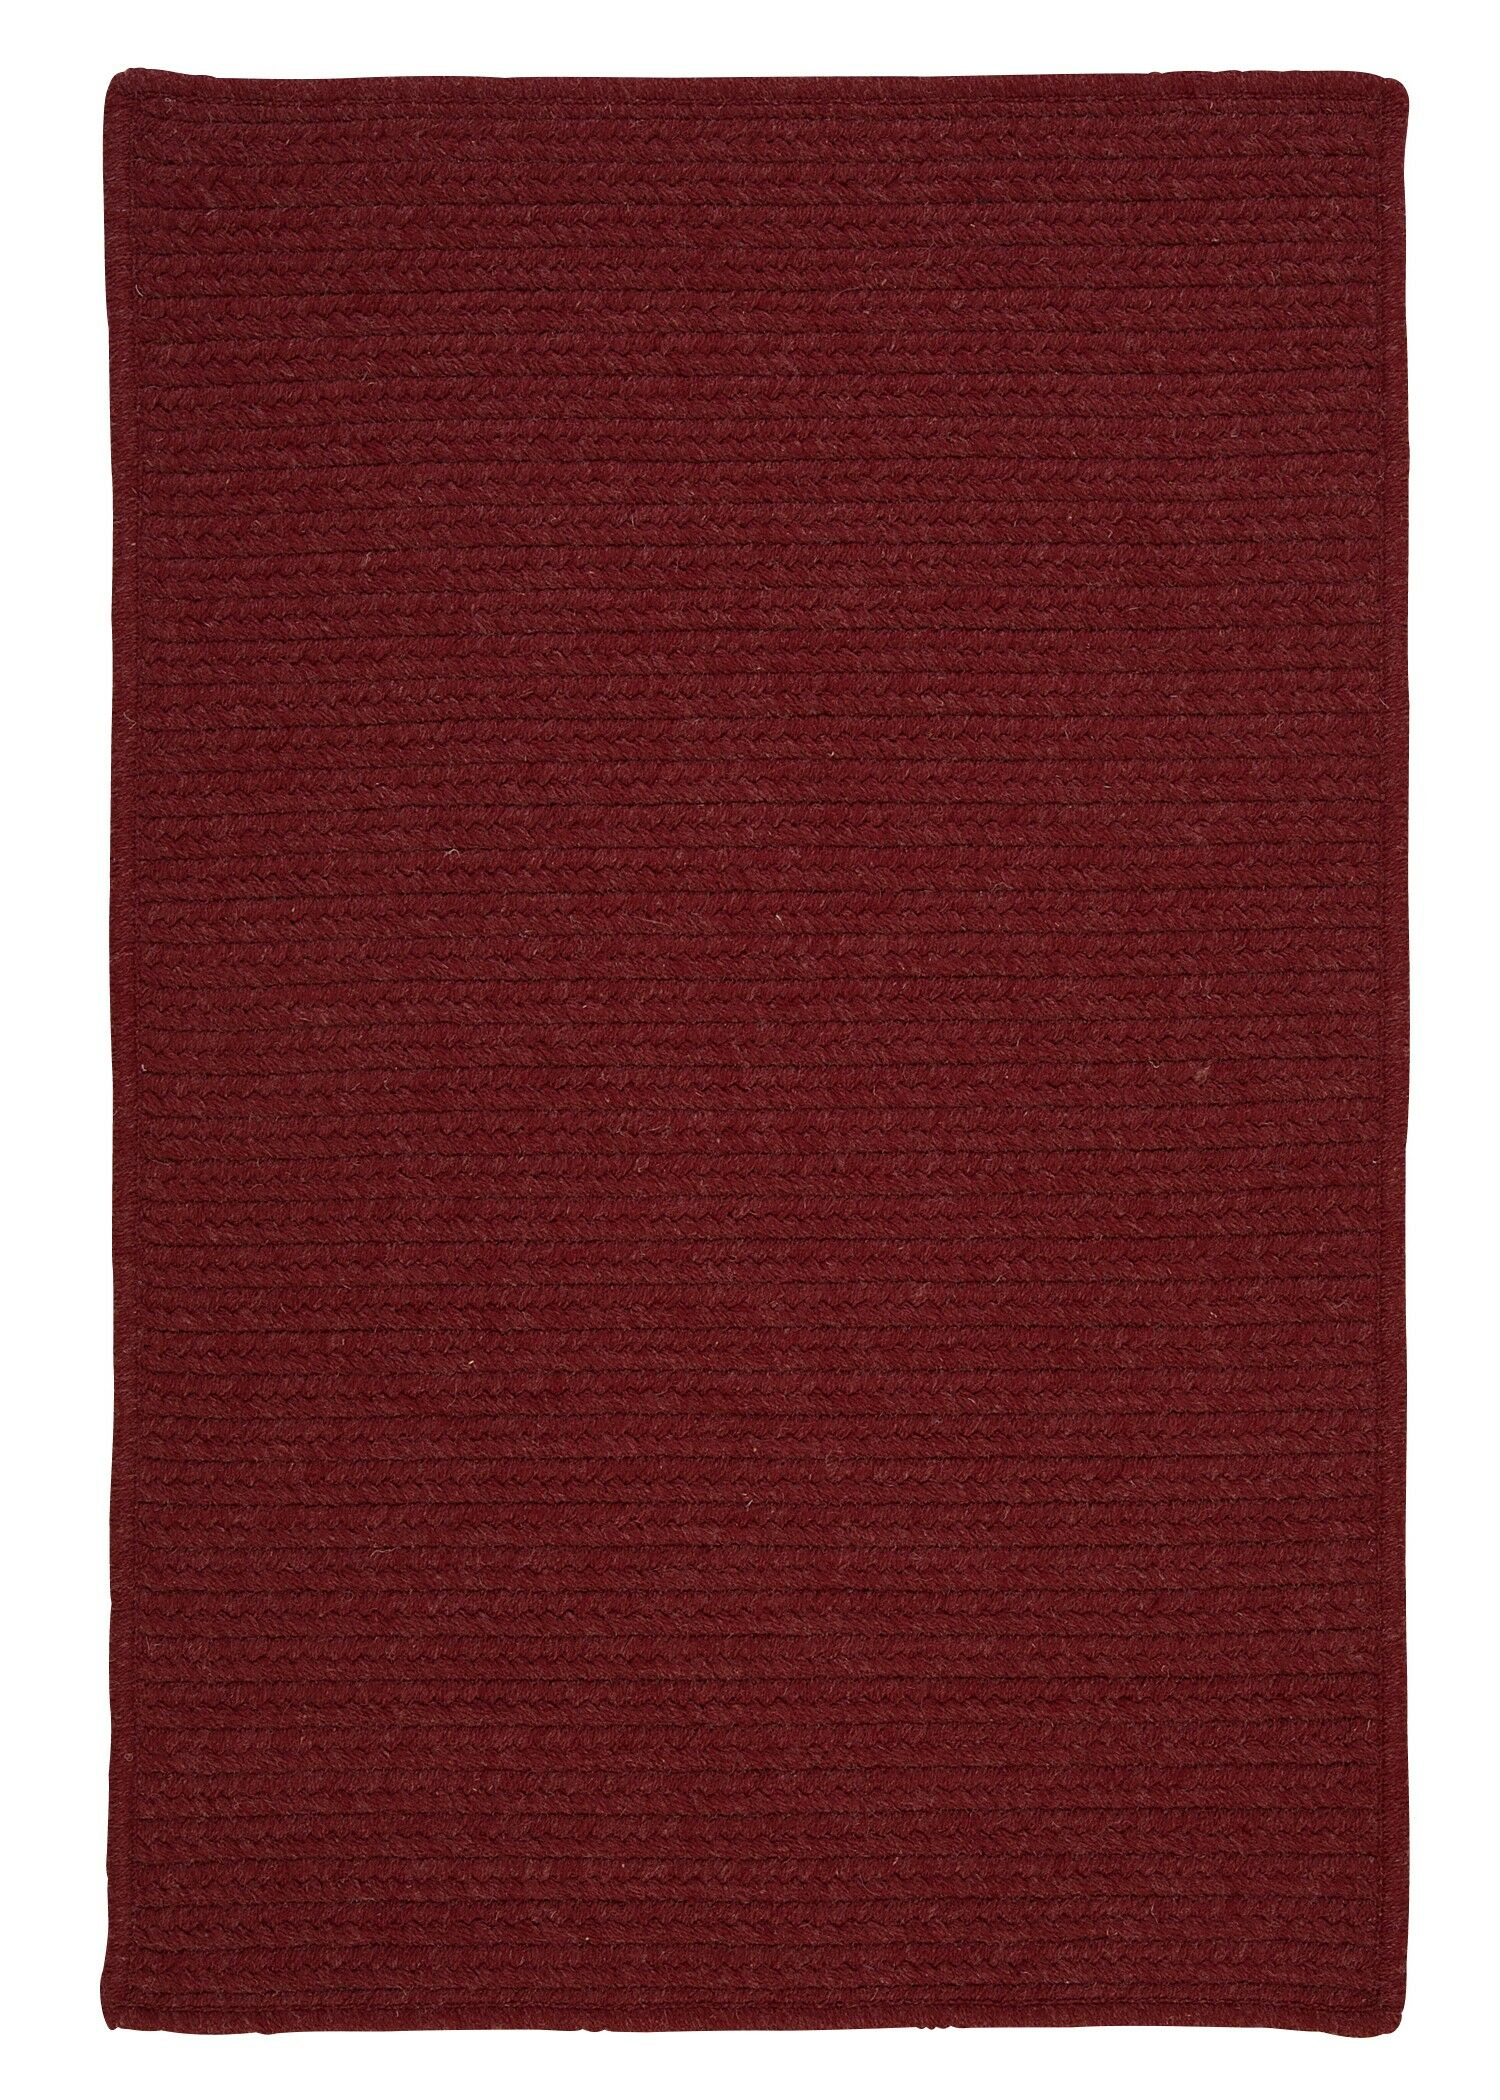 Courtyard Sangria Rug Fringe: Included, Rug Size: Runner 2' x 8'